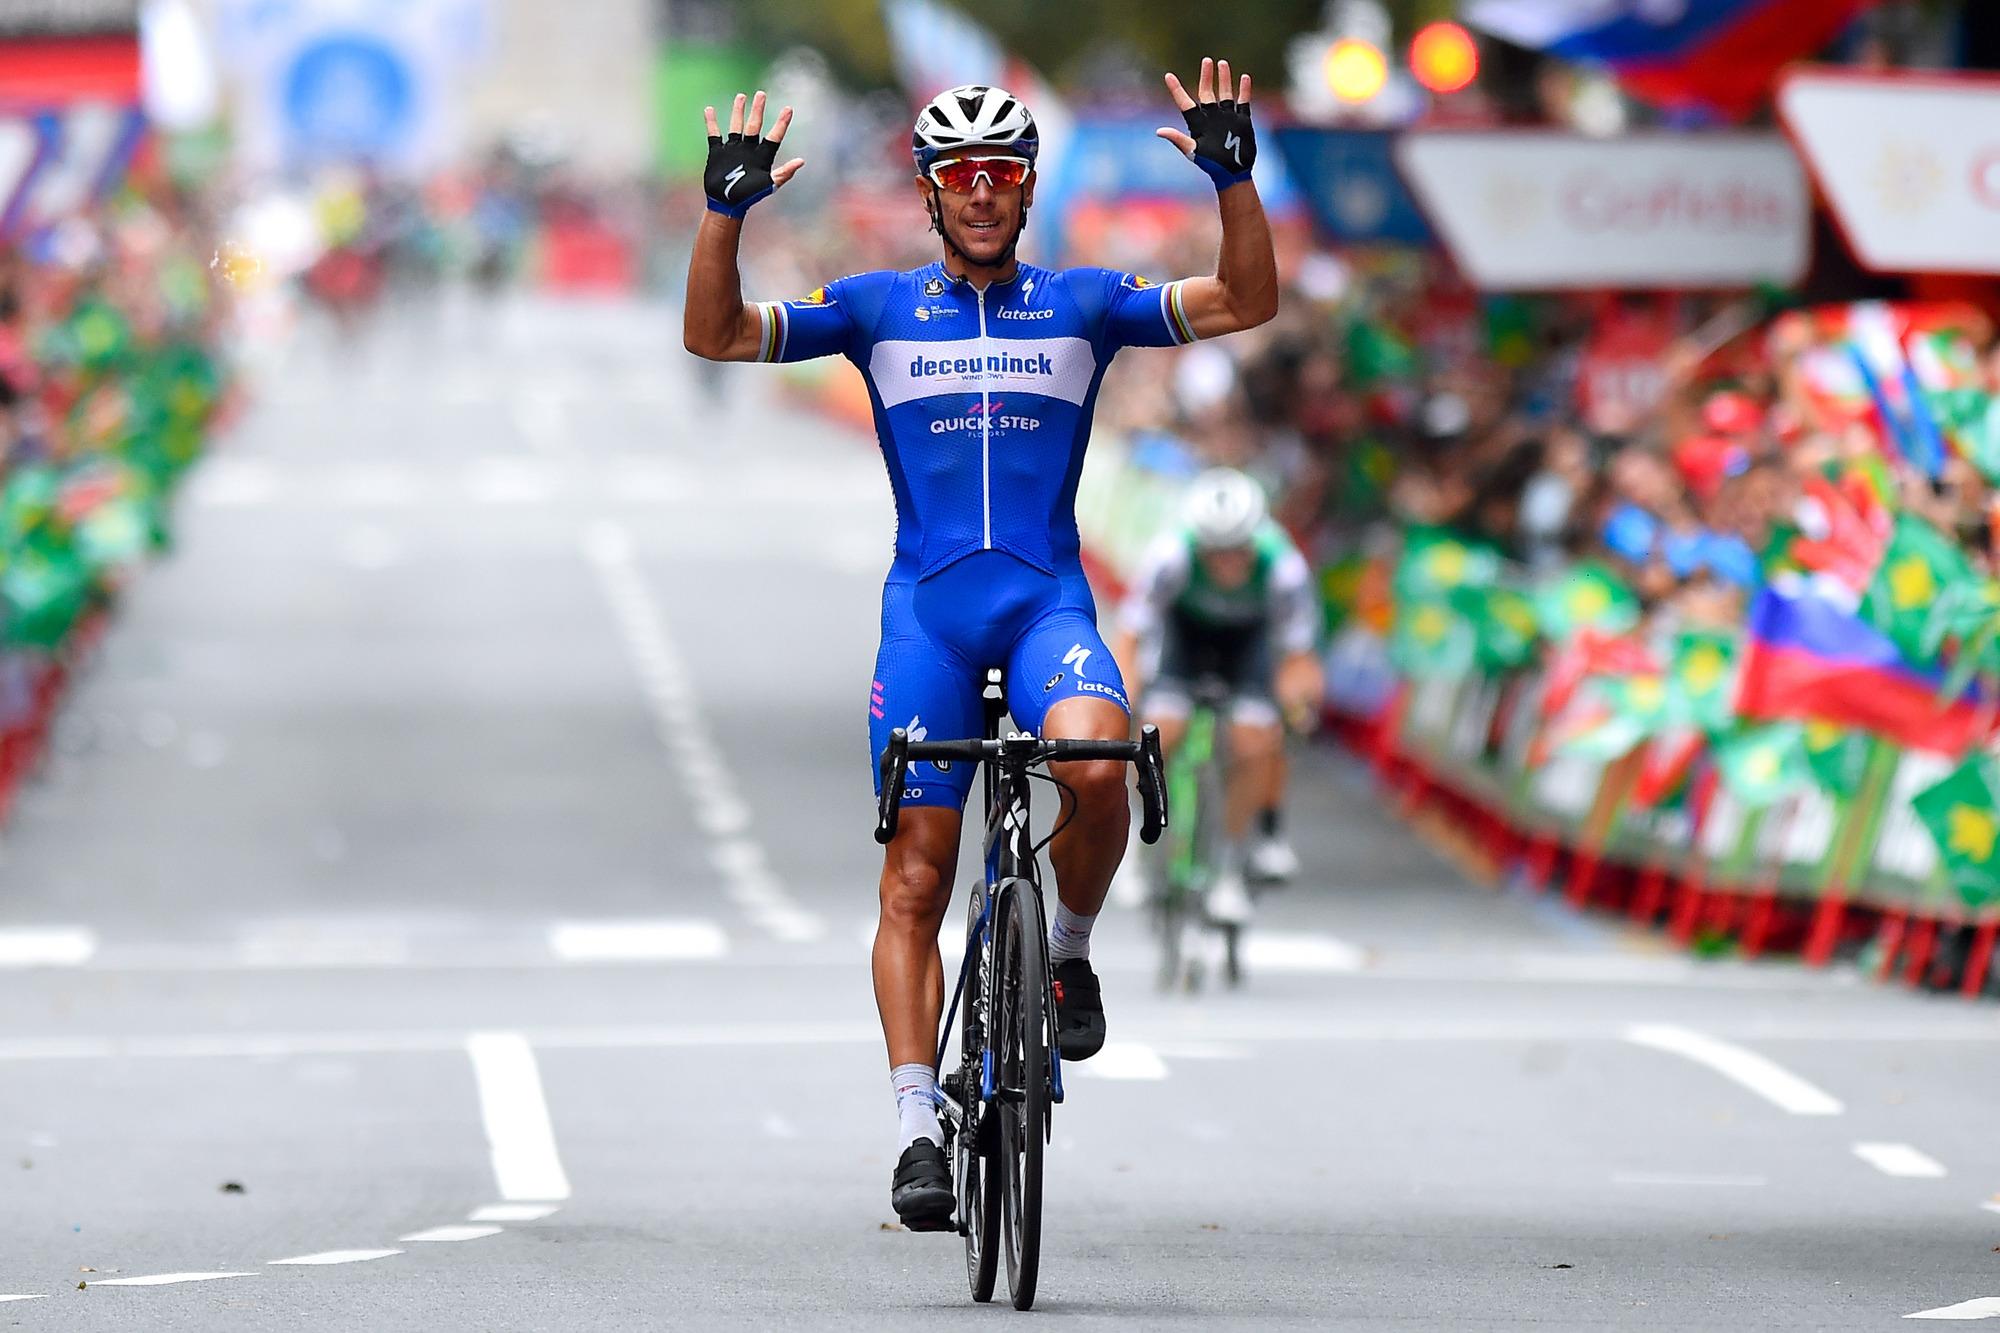 Vuelta a Espana stage 12